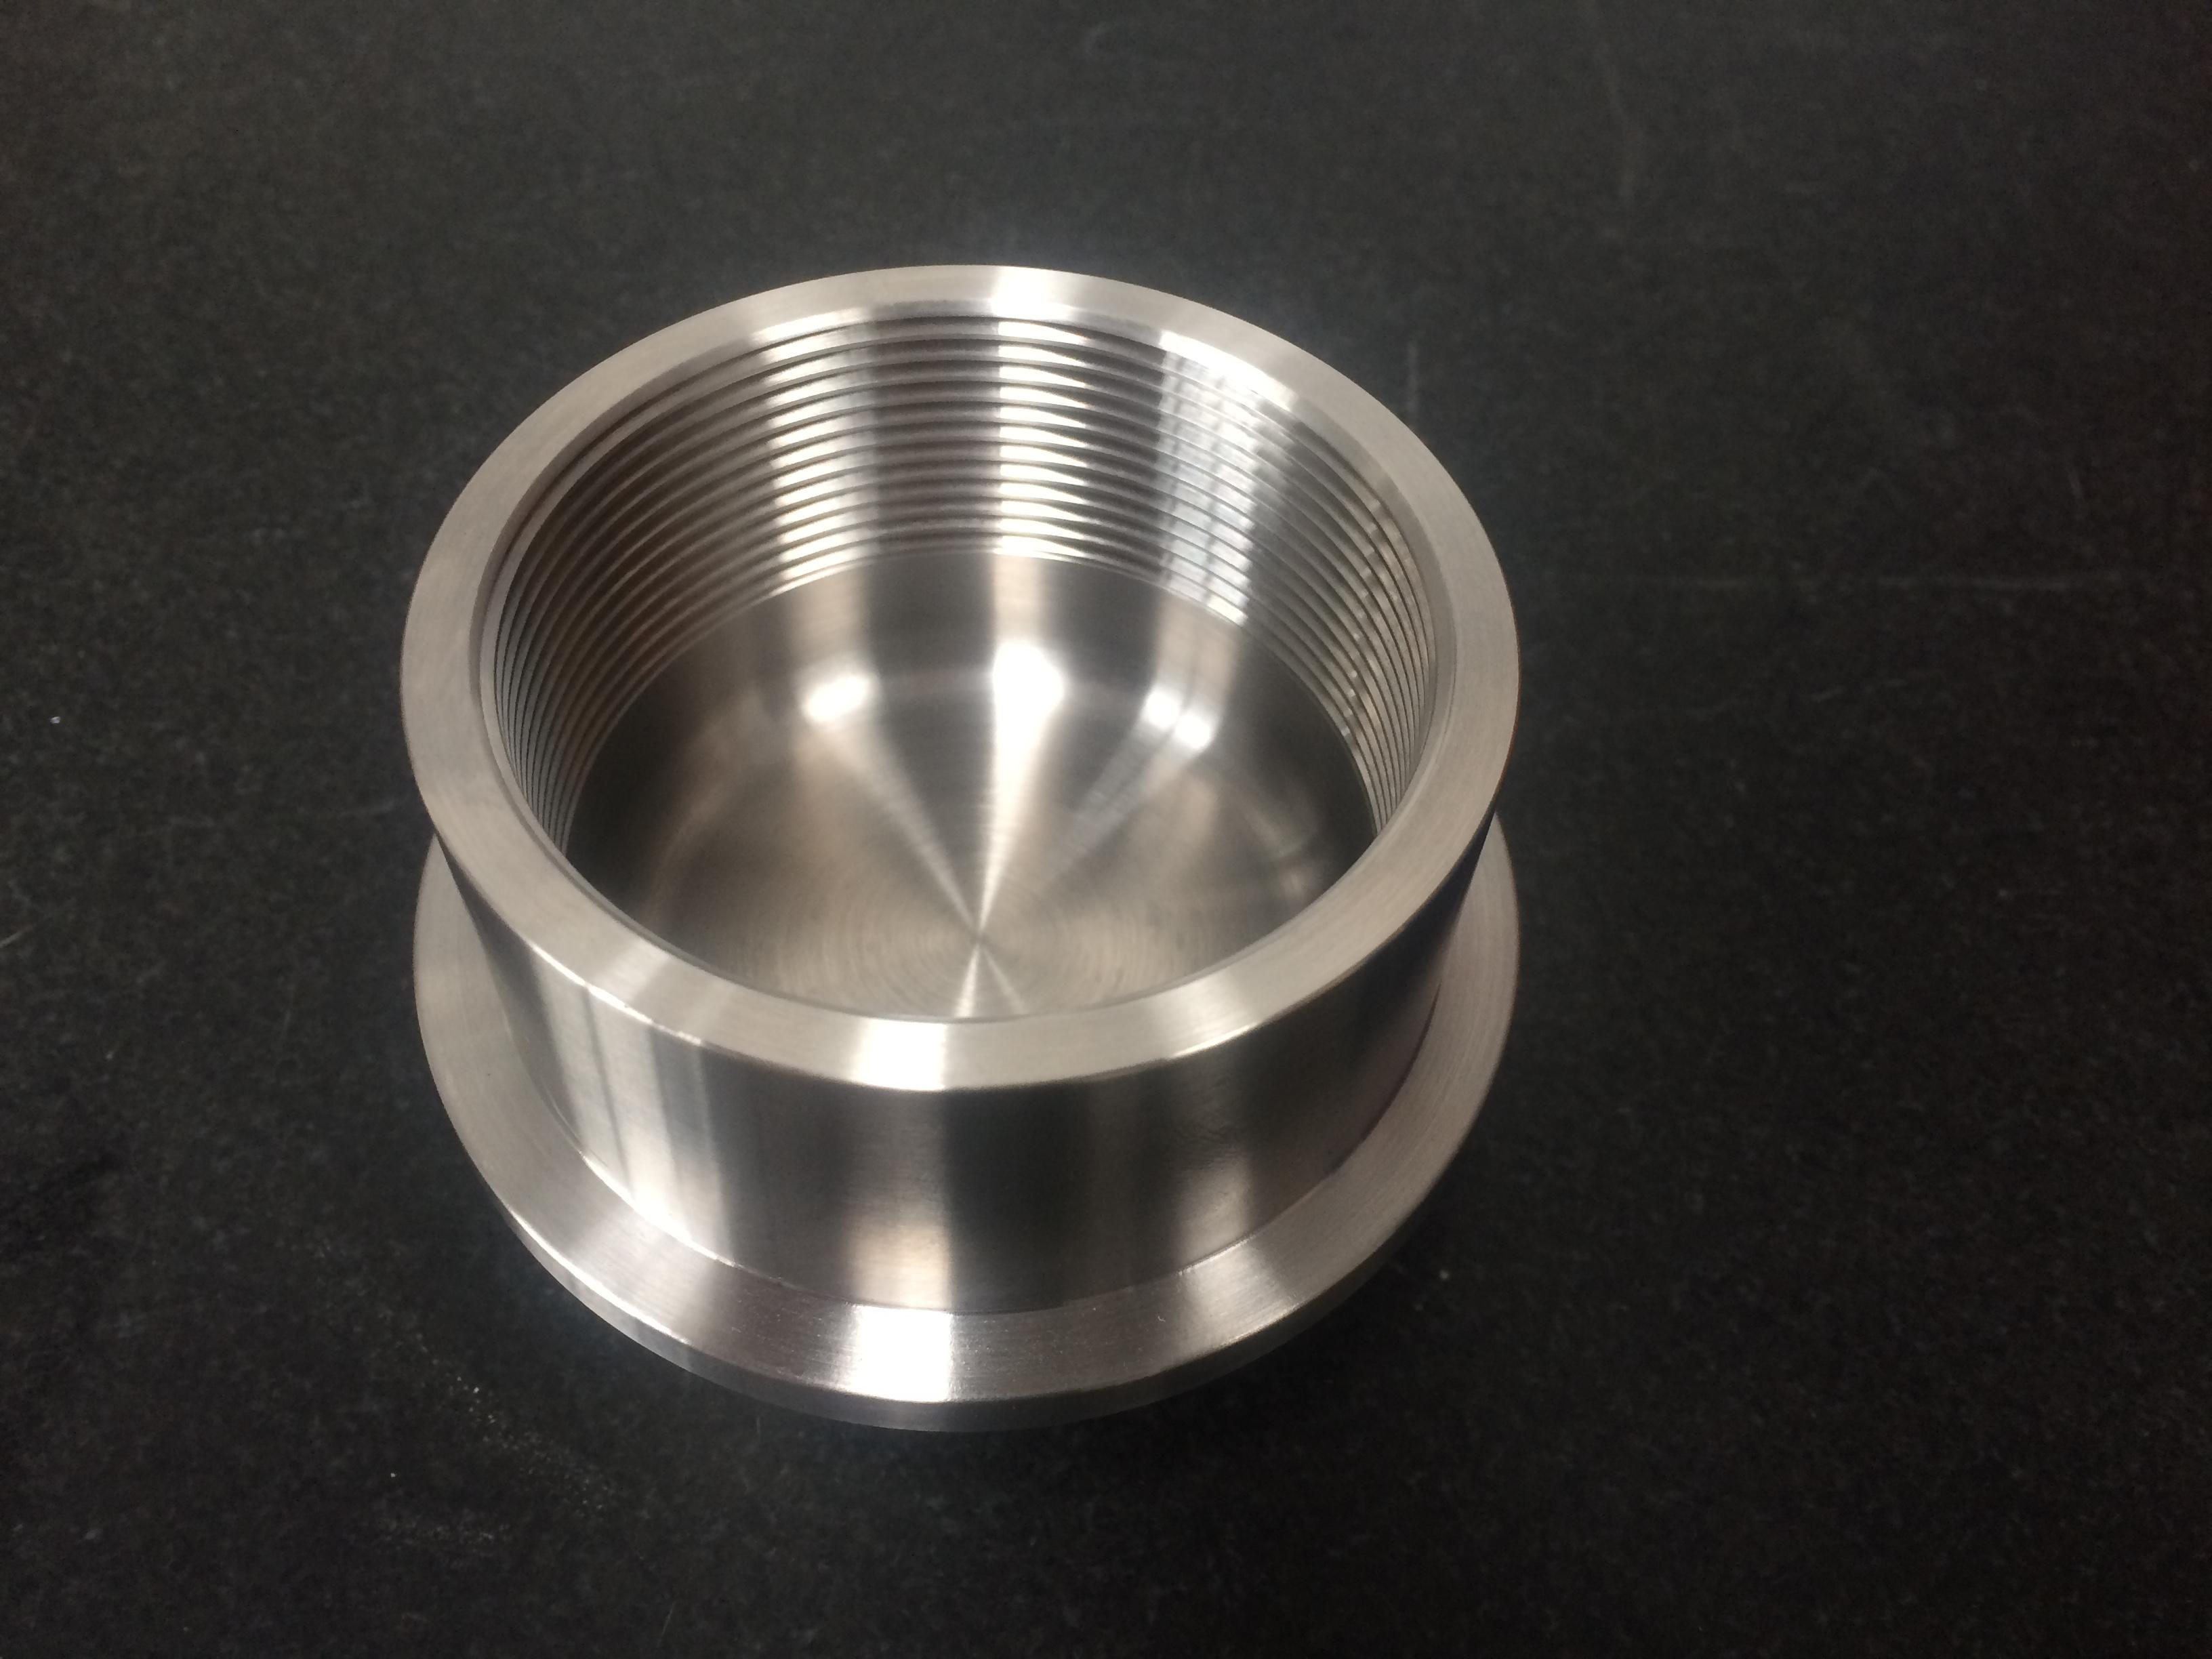 Xyz Cnc Machining Precision Manufacturing In Poole Dorset